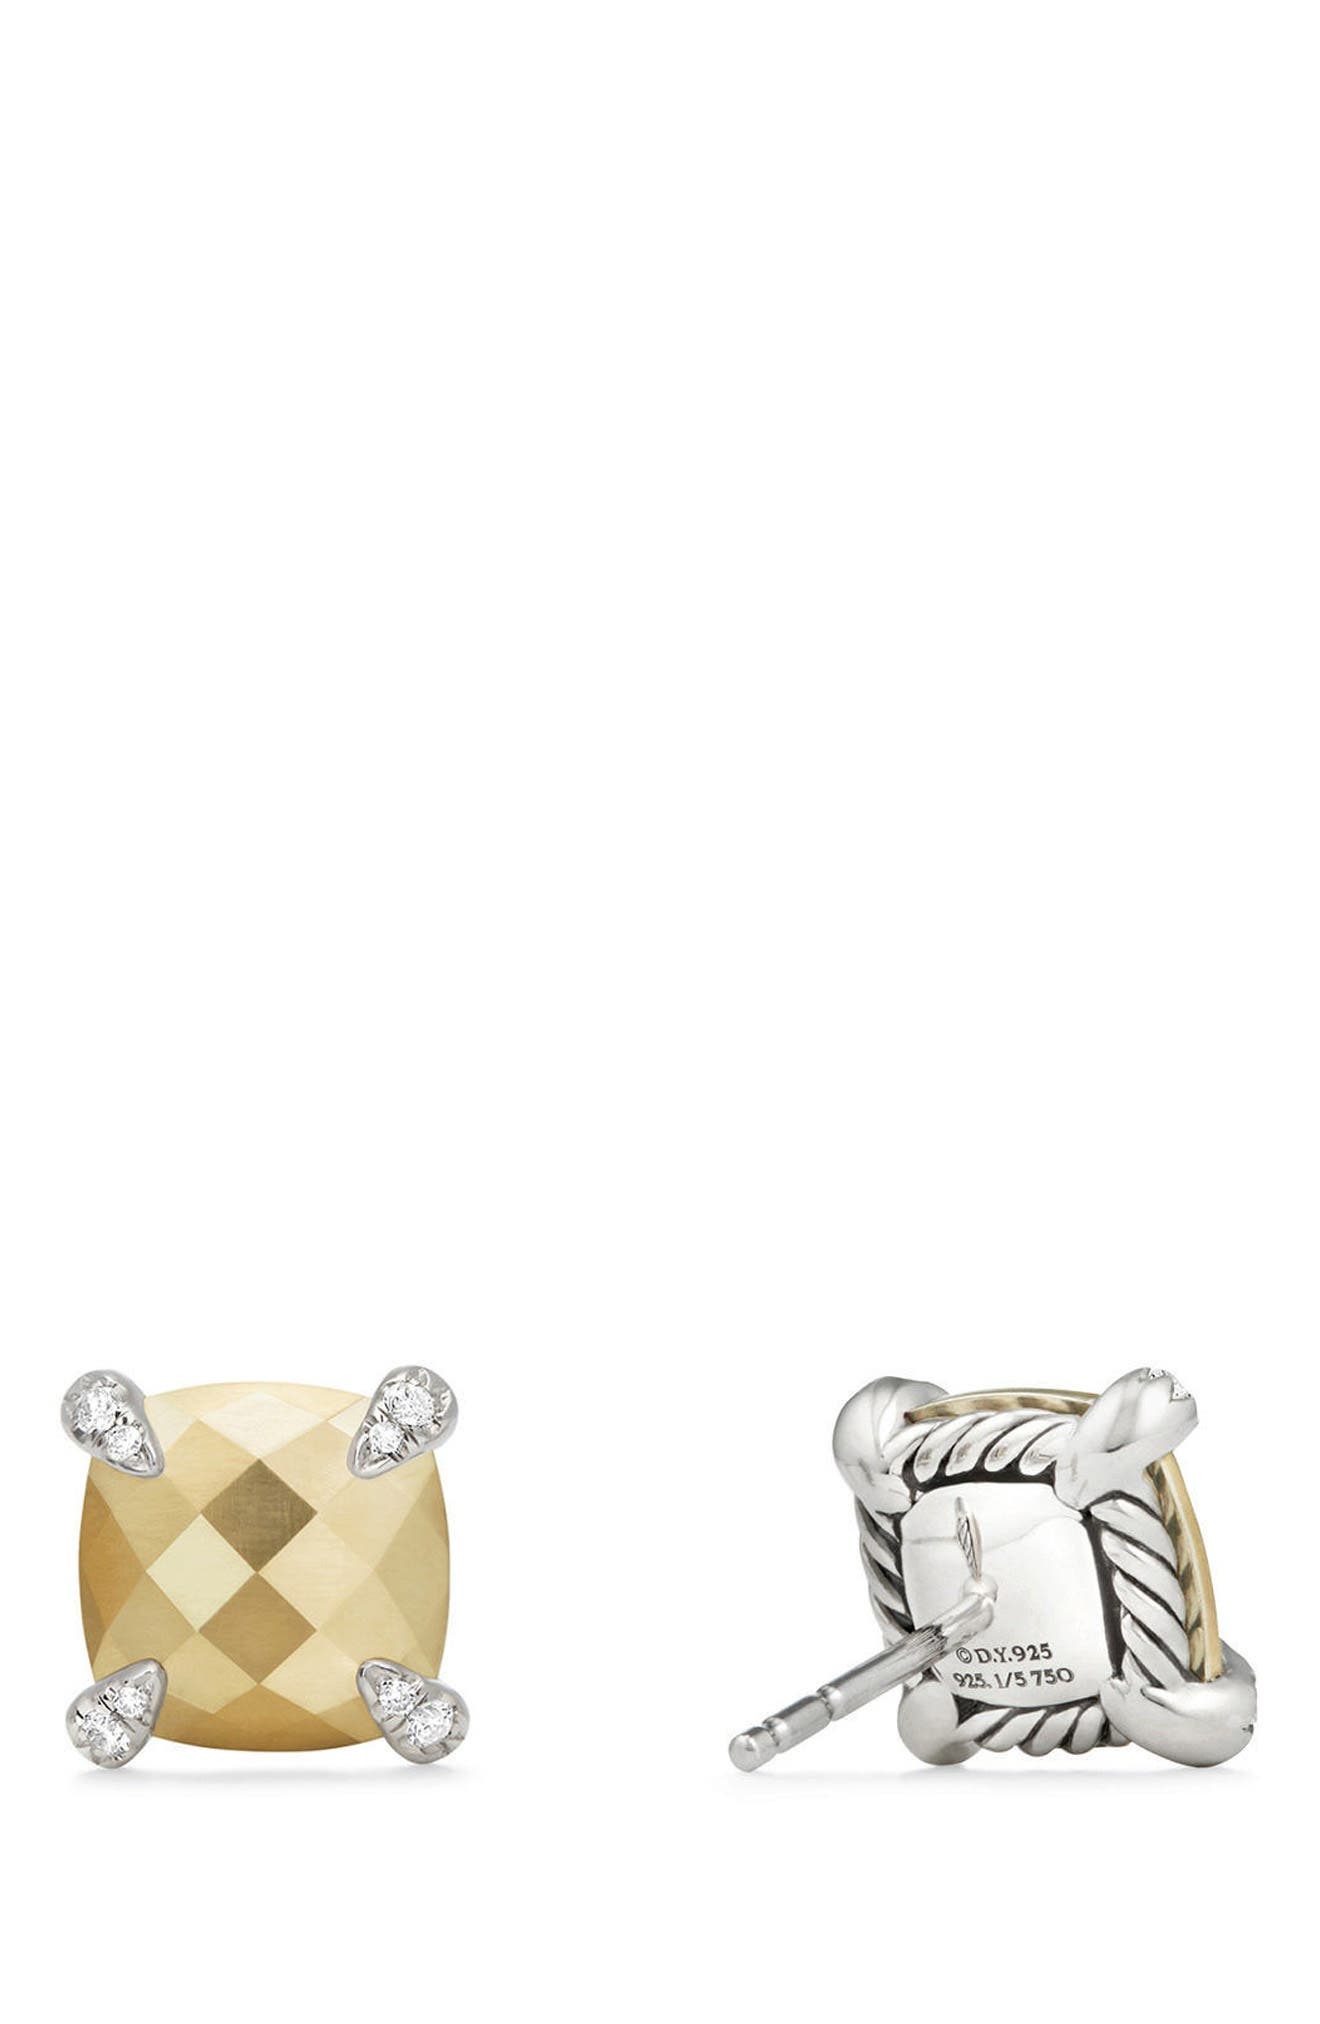 DAVID YURMAN, Châtelaine Earrings with Diamonds, Main thumbnail 1, color, GOLD DOME?